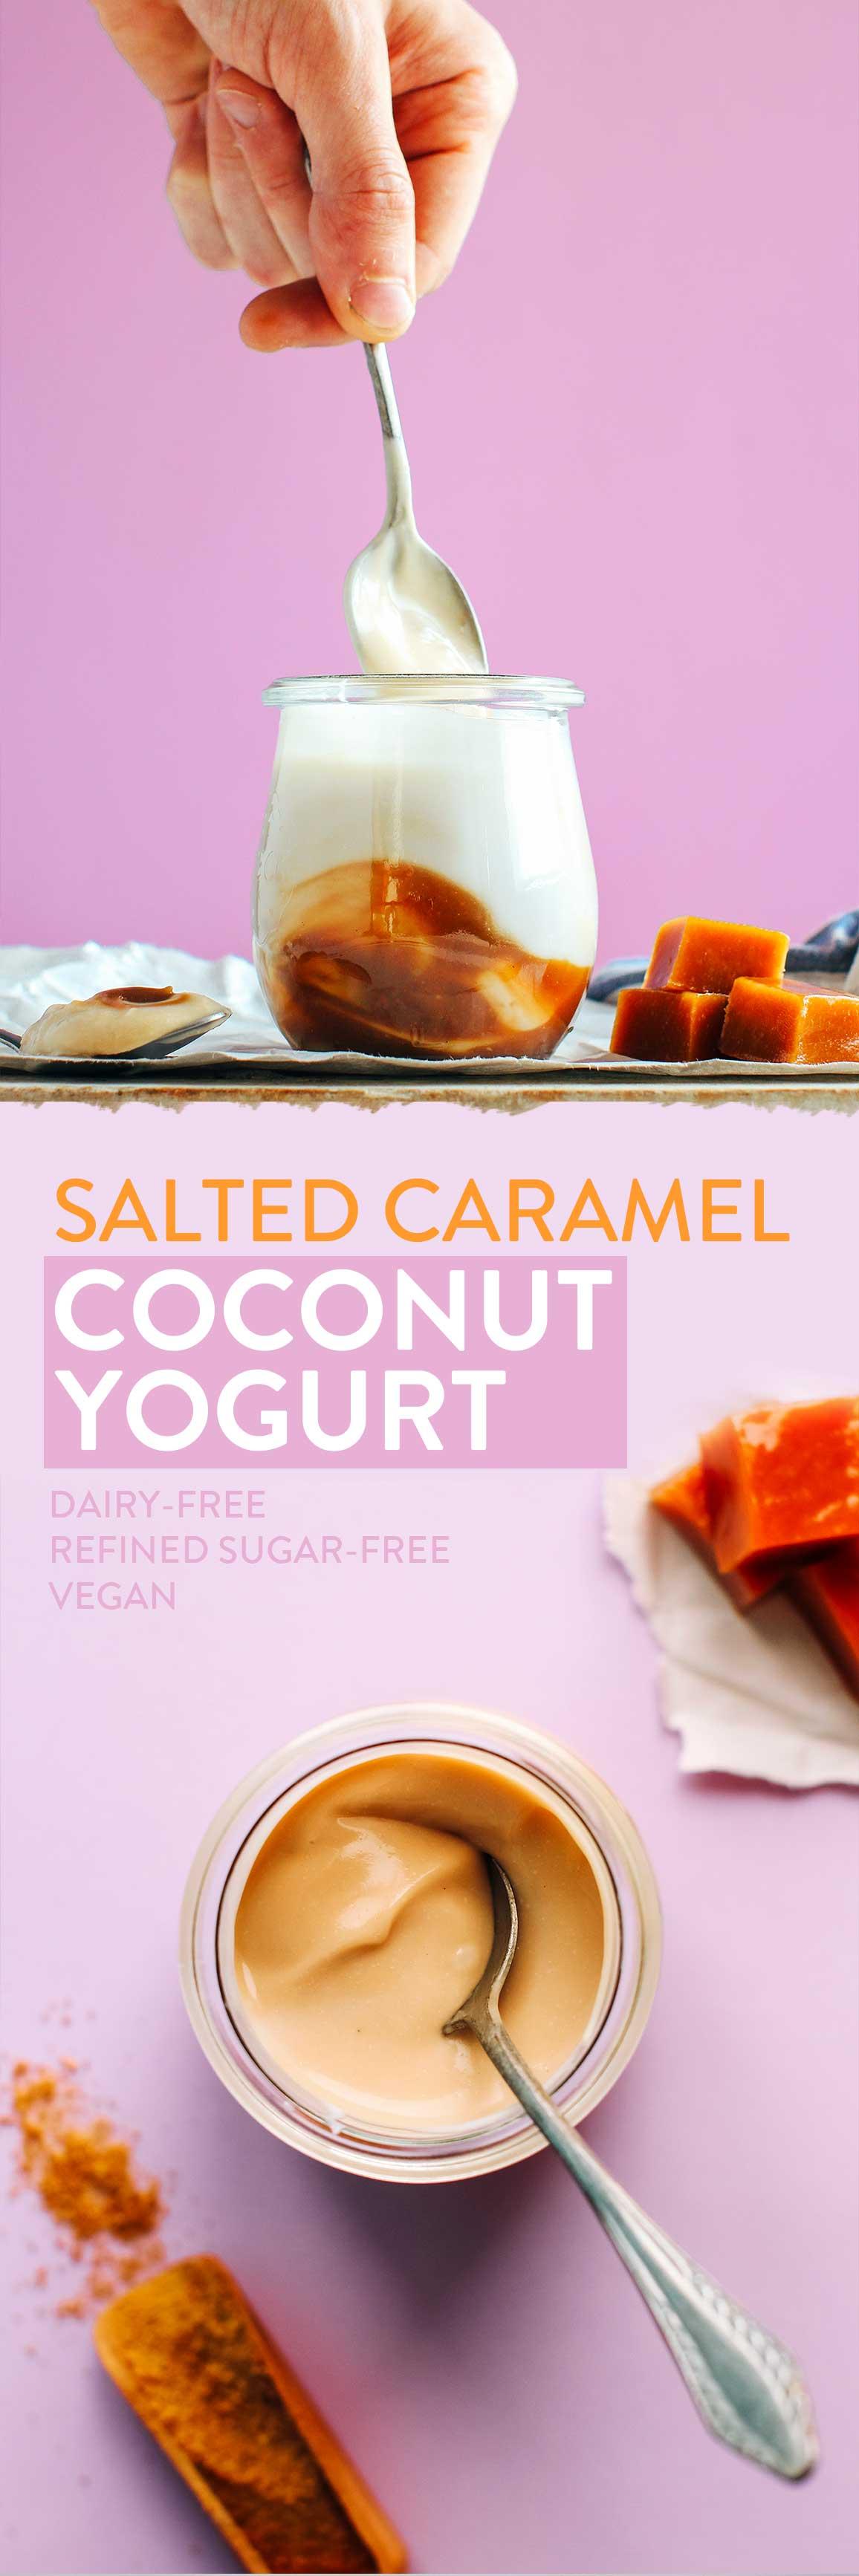 Salted Caramel Coconut Yogurt